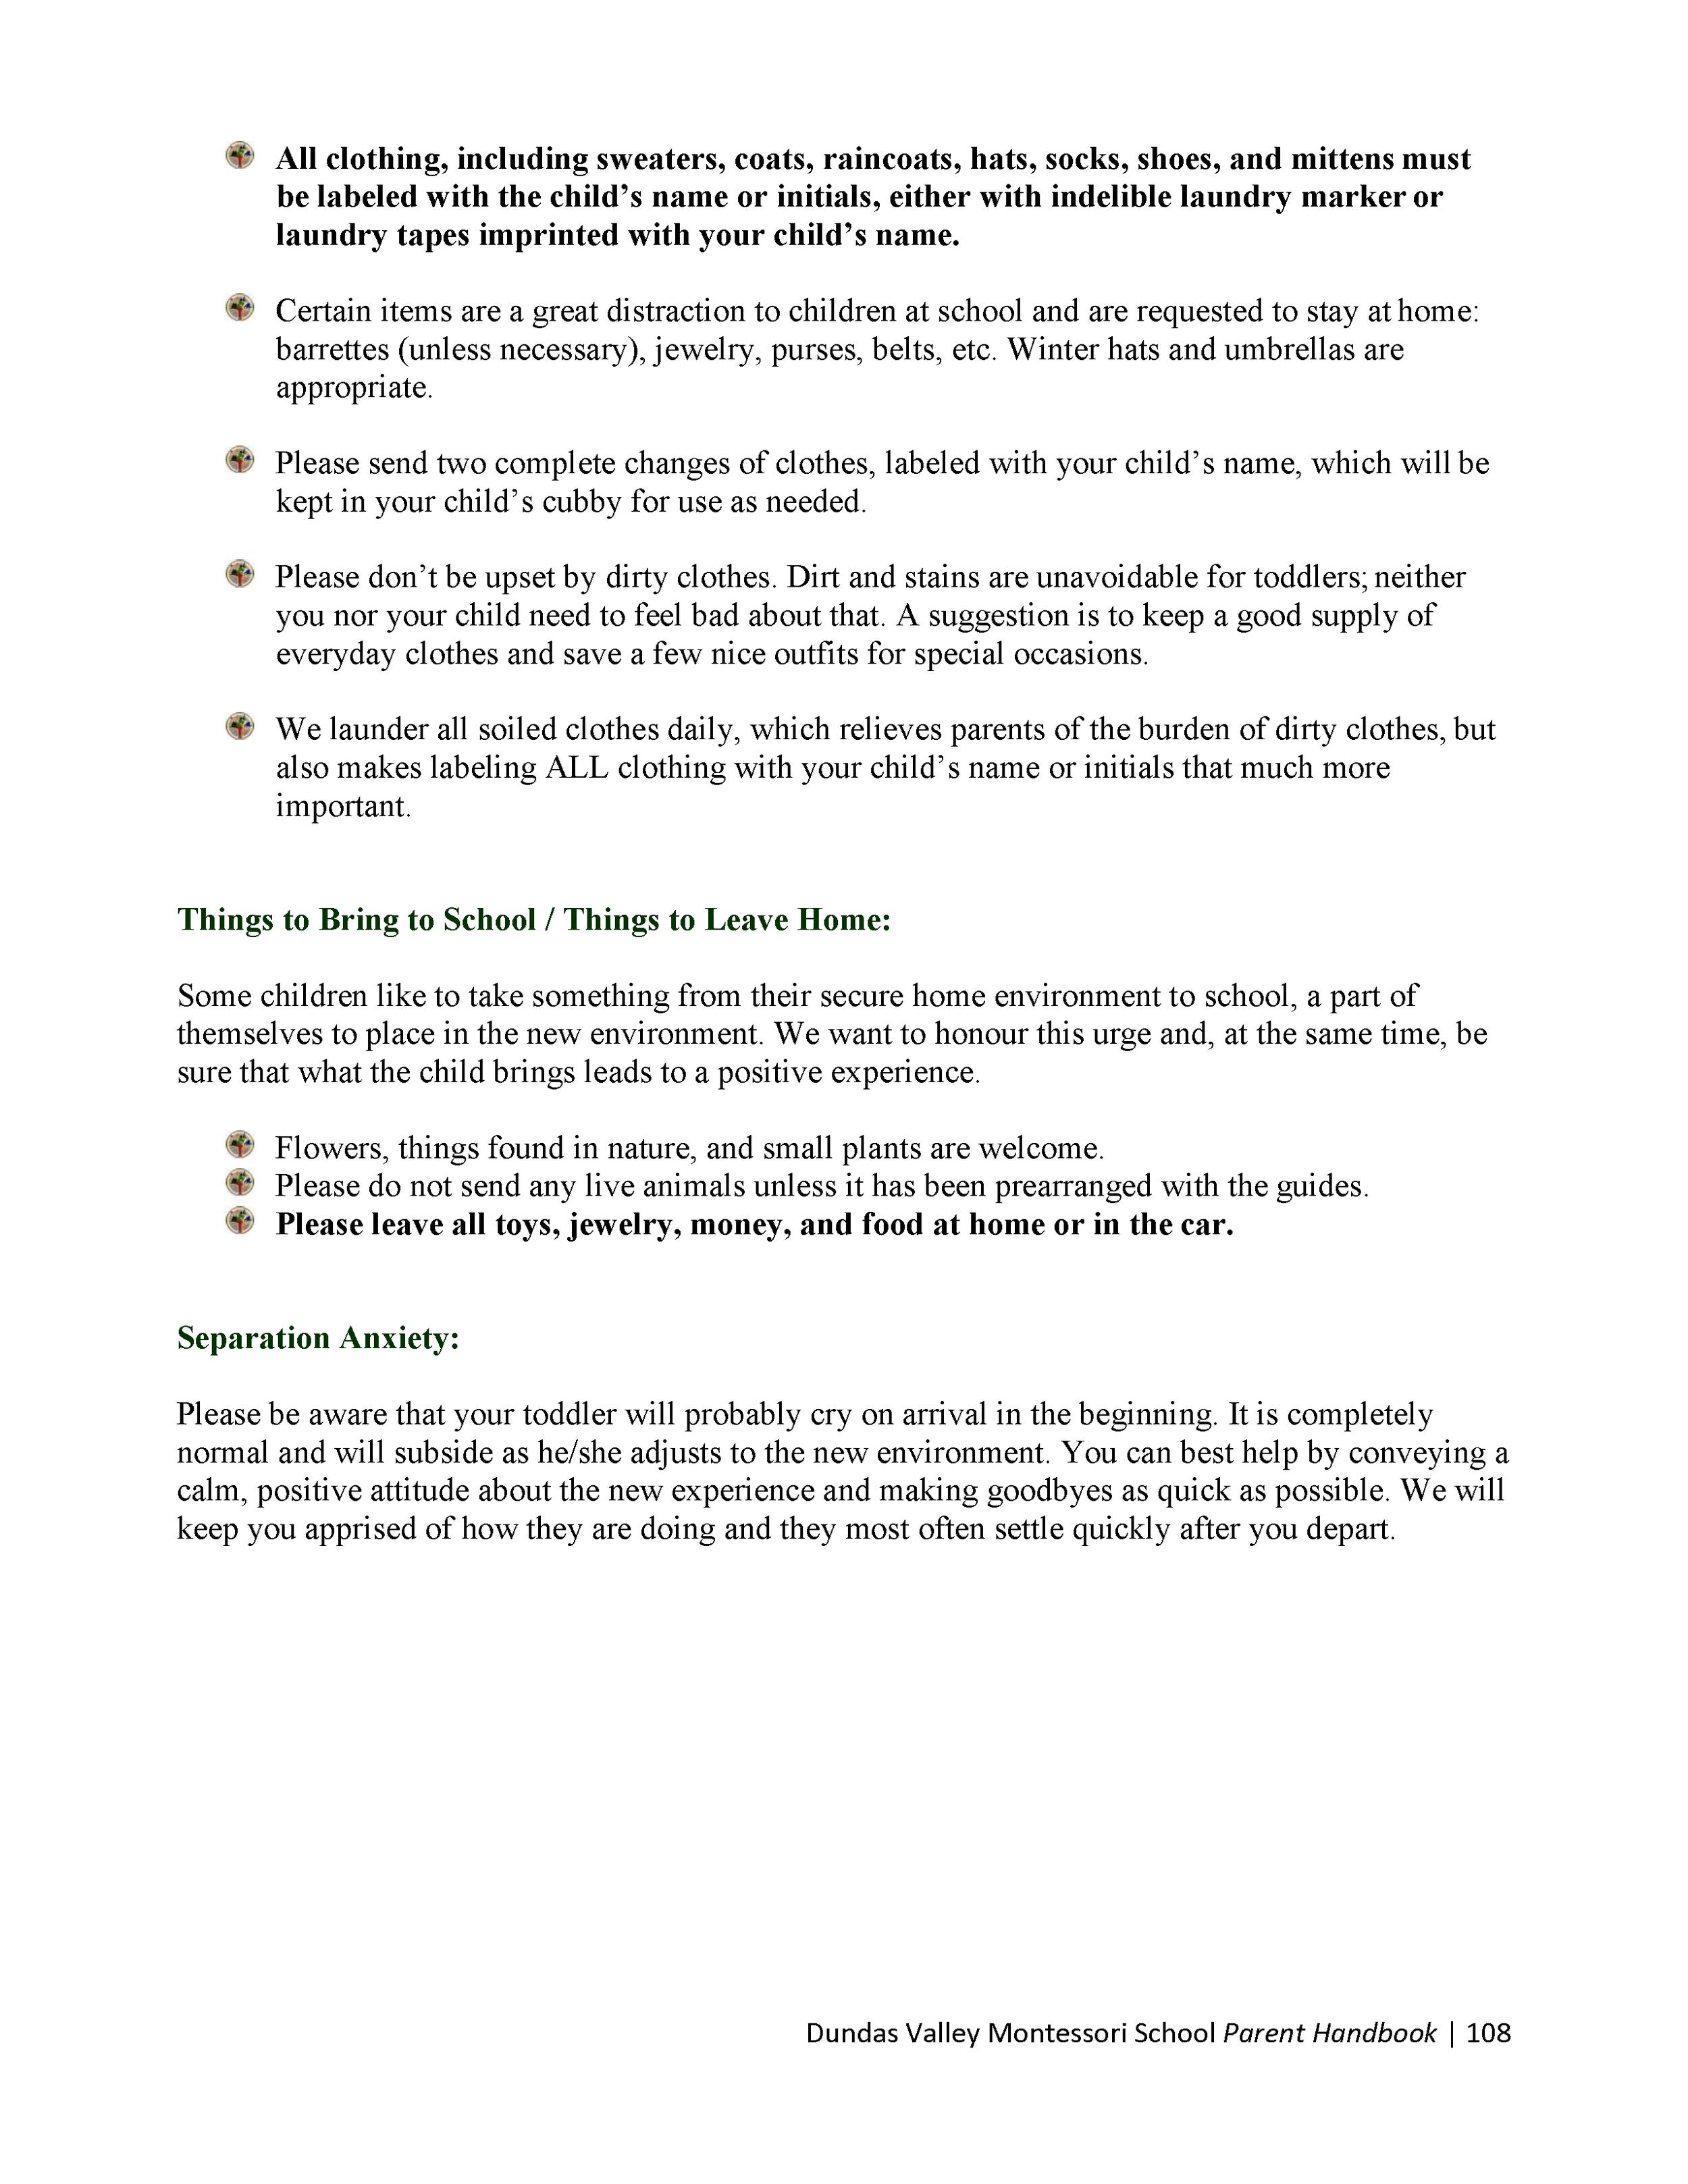 DVMS-Parent-Handbook-19-20_Page_110.png